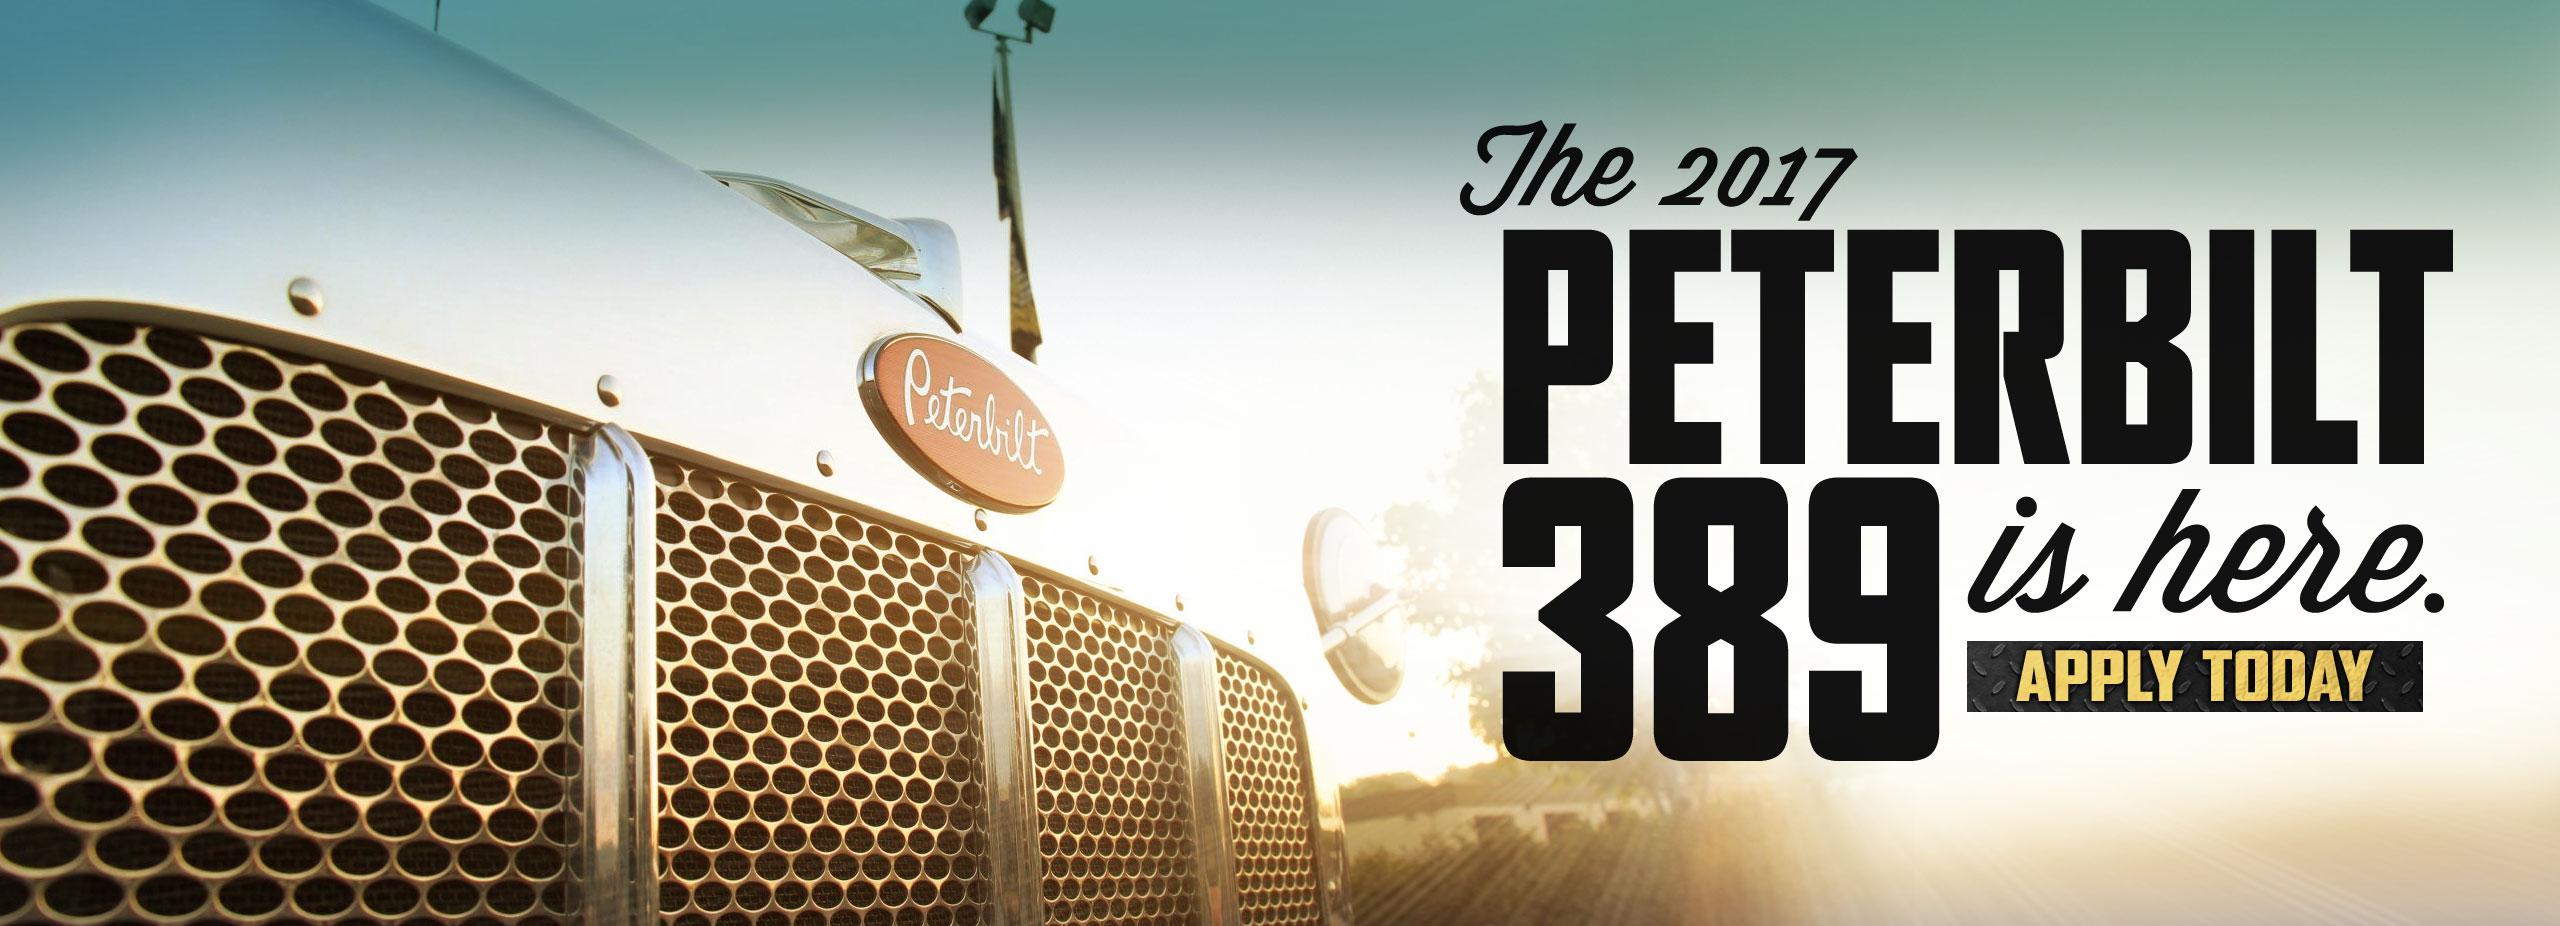 2017 Peterbilt 379